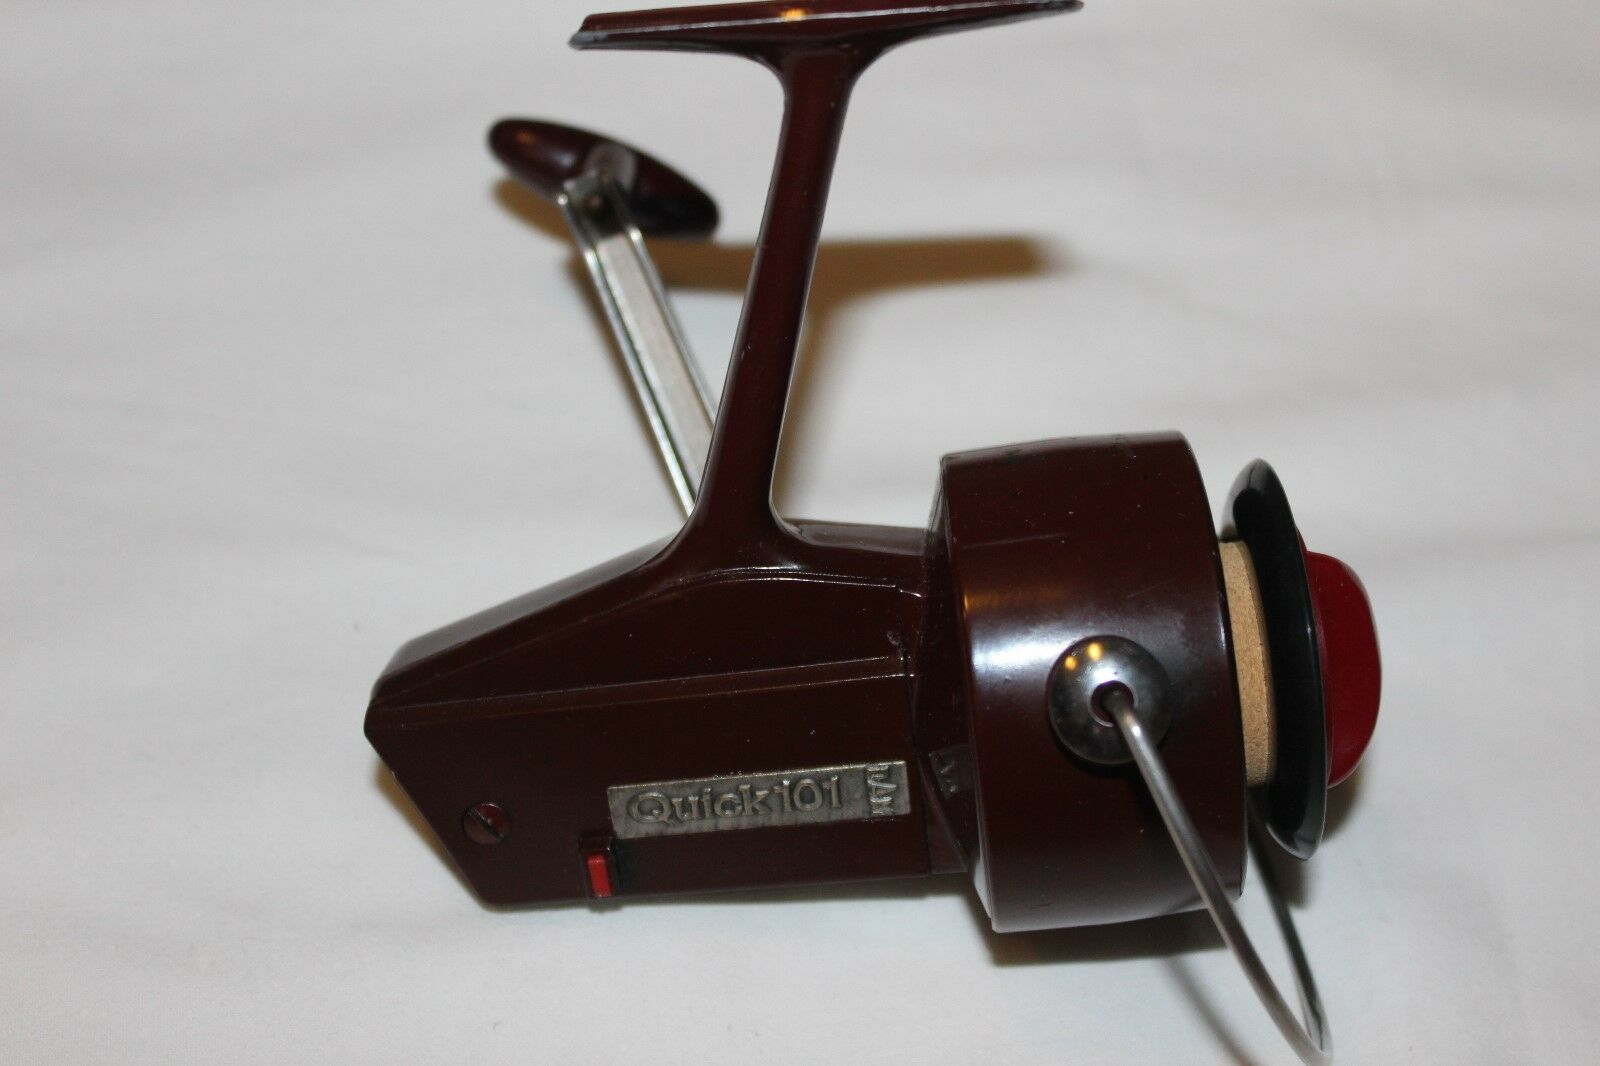 Dam Quick 101 specialeee modello rossonr394